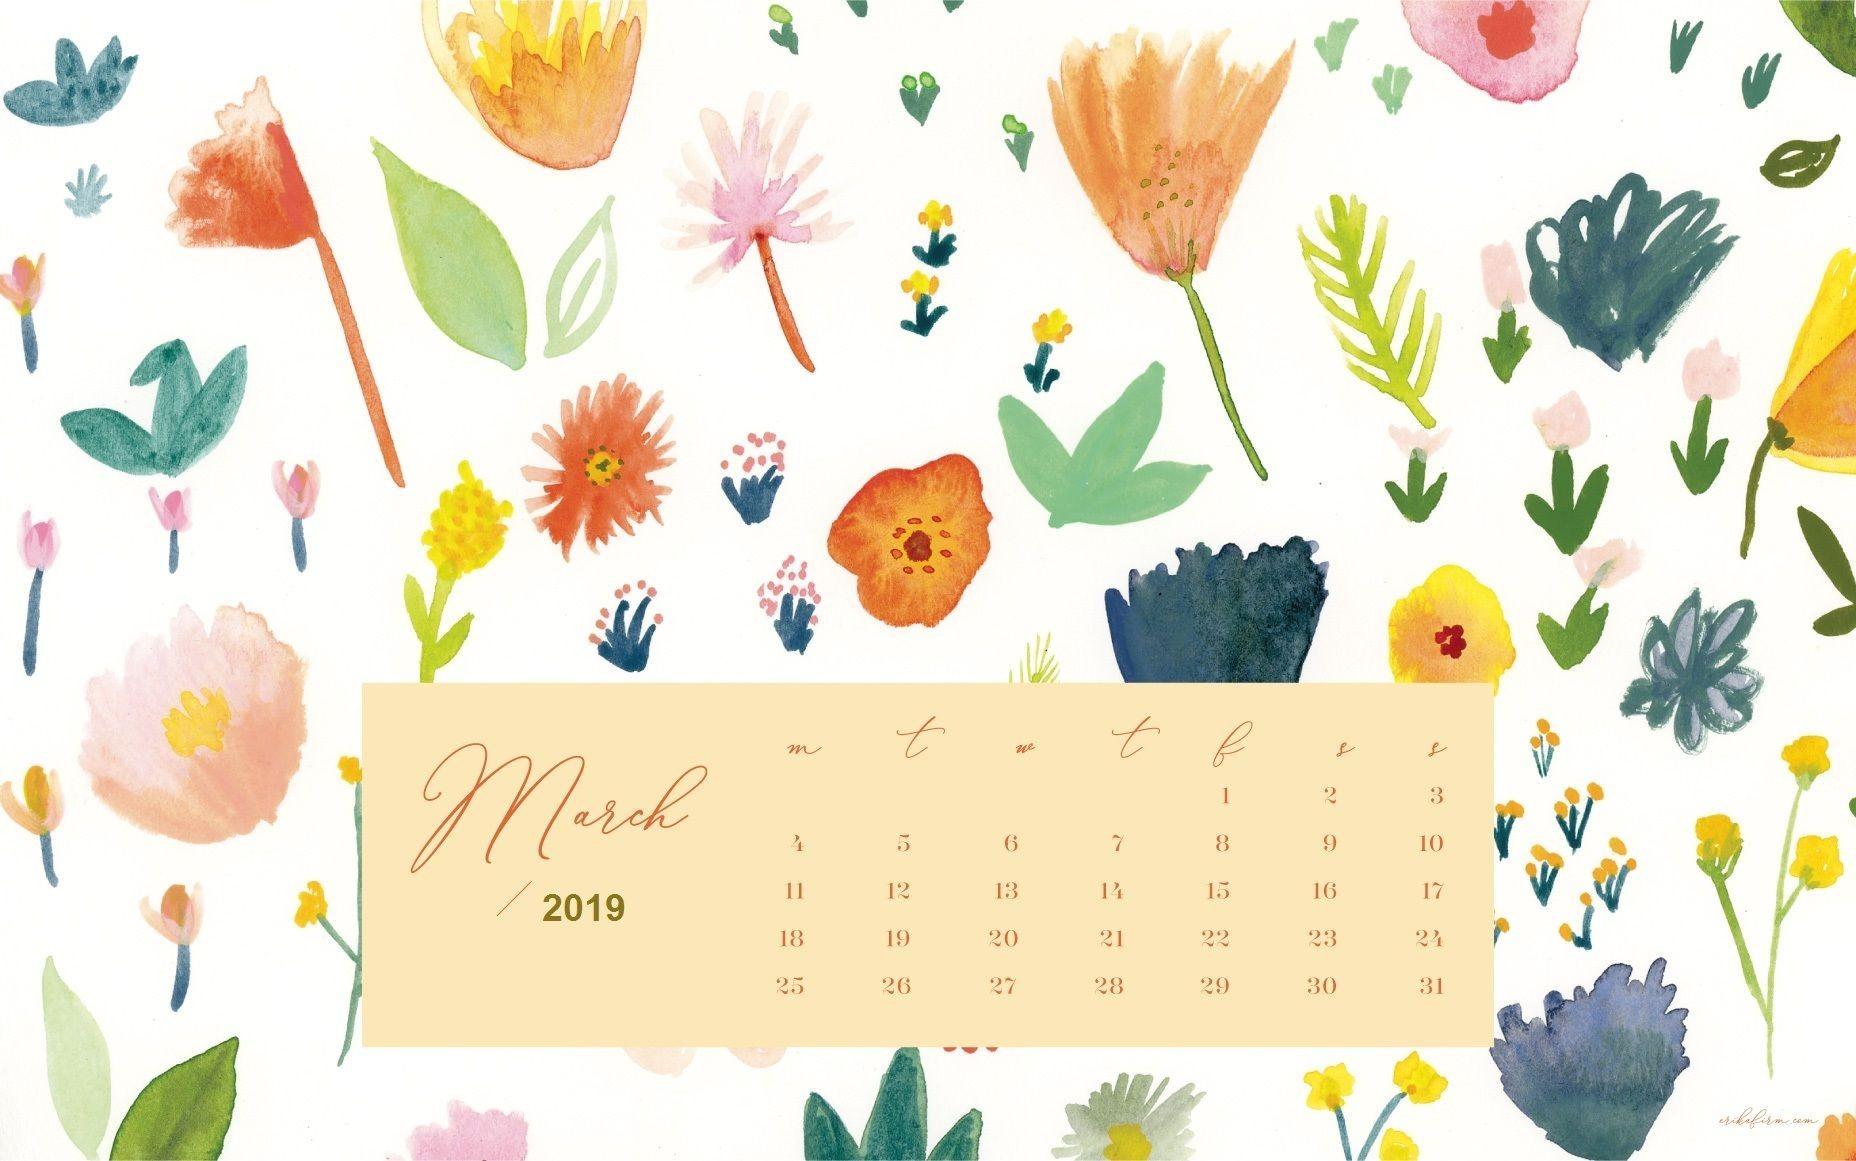 2019 Calendar Excel with Holidays March 2019 Calendar Floral Background 2019 Calendar Excel with Holidays